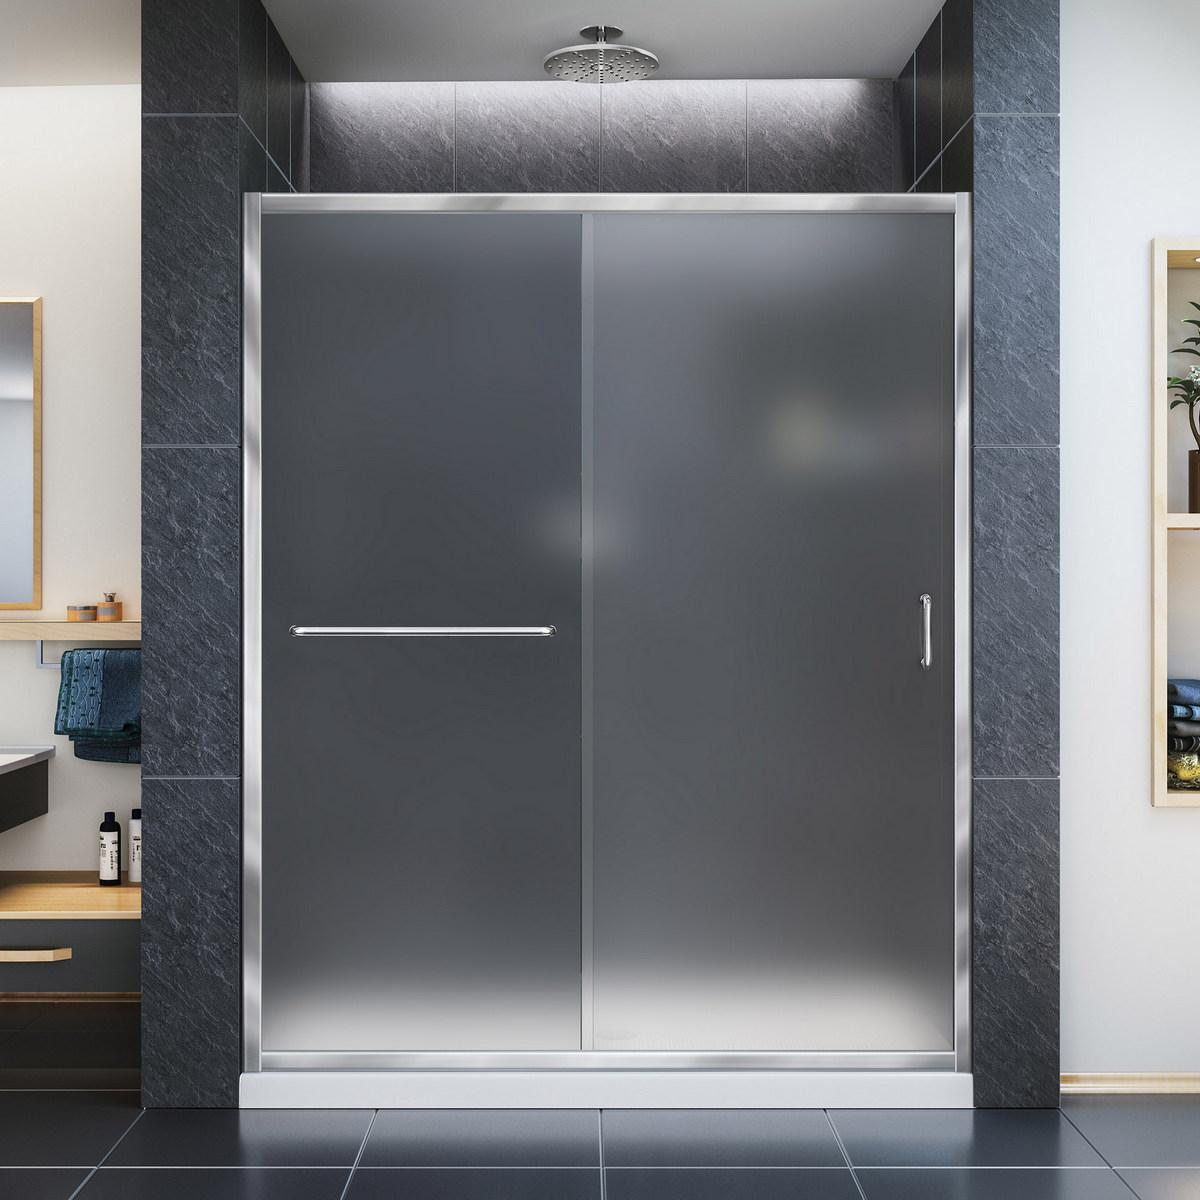 Dreamline Frosted Sliding Shower Door Chrome Right Drain Biscuit Base